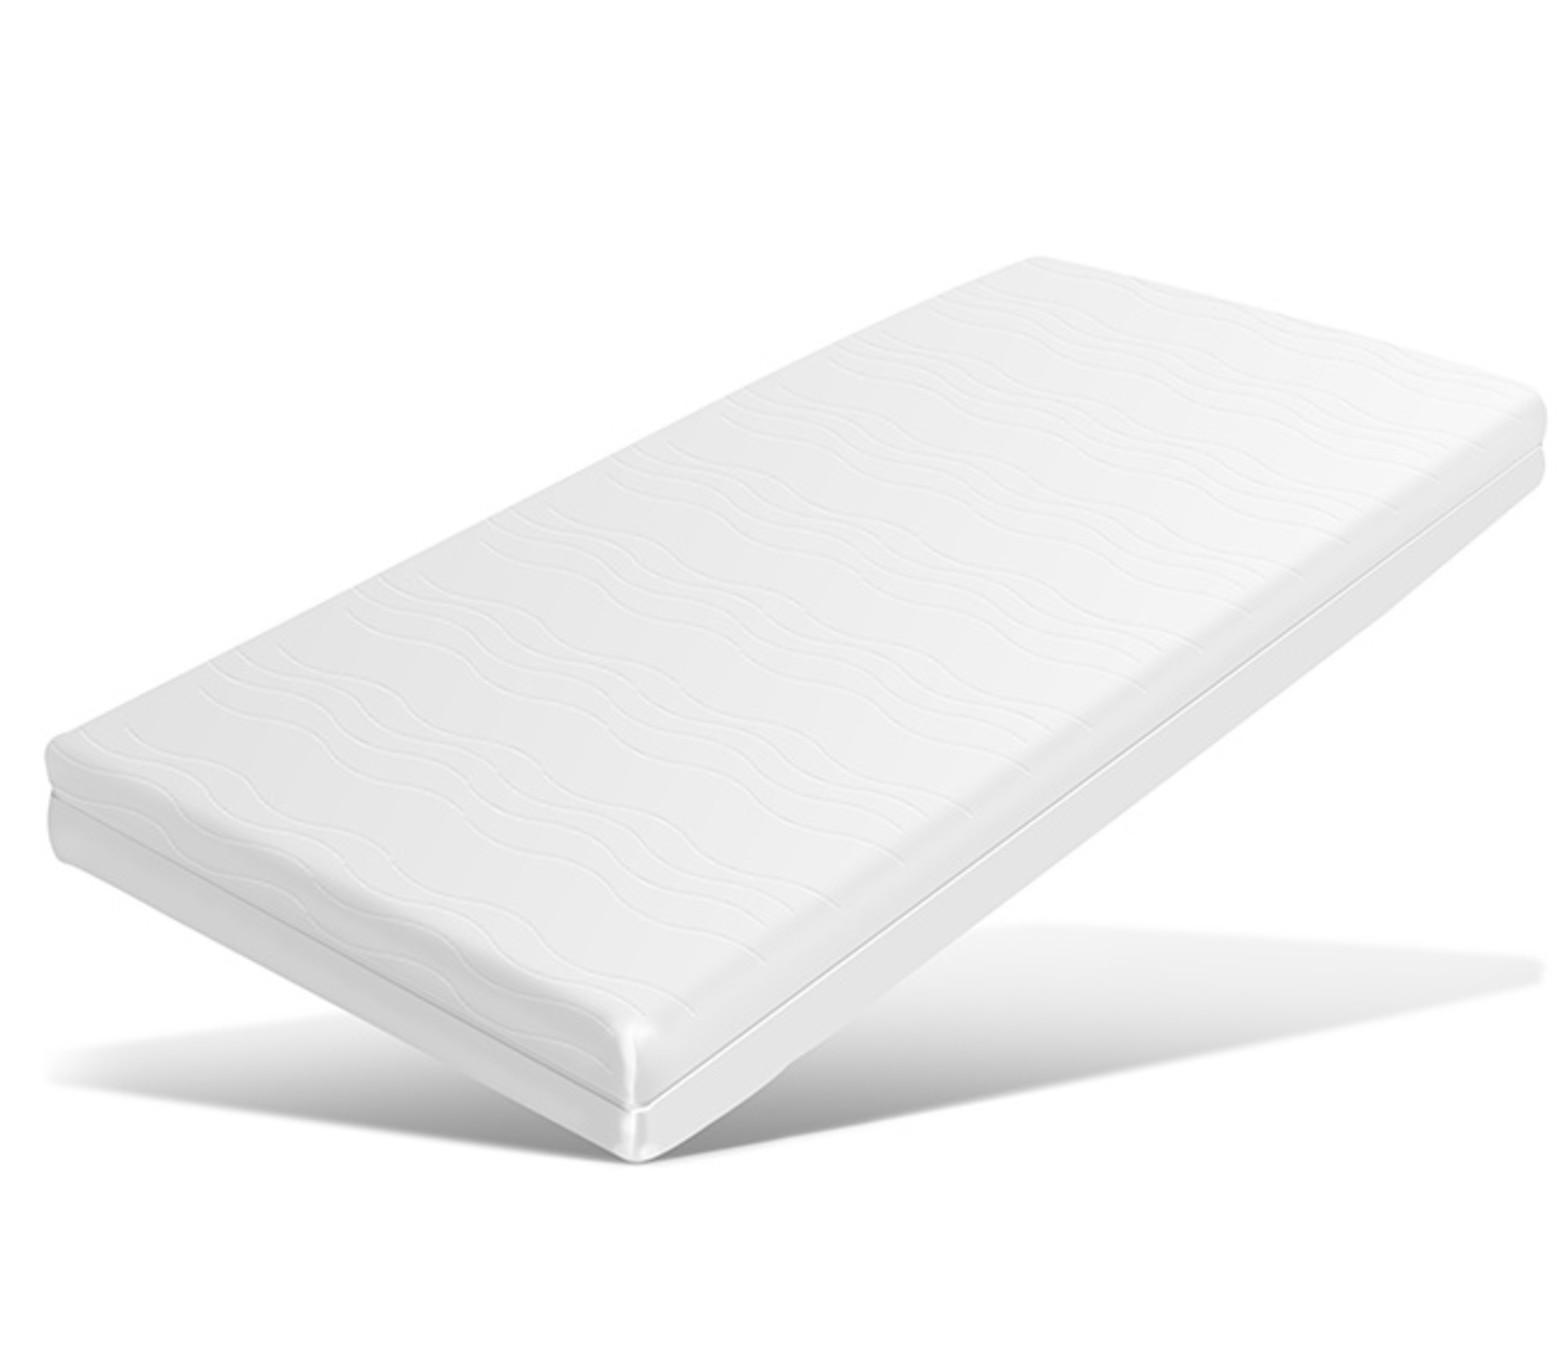 Polyether Matras Olivia SG 25